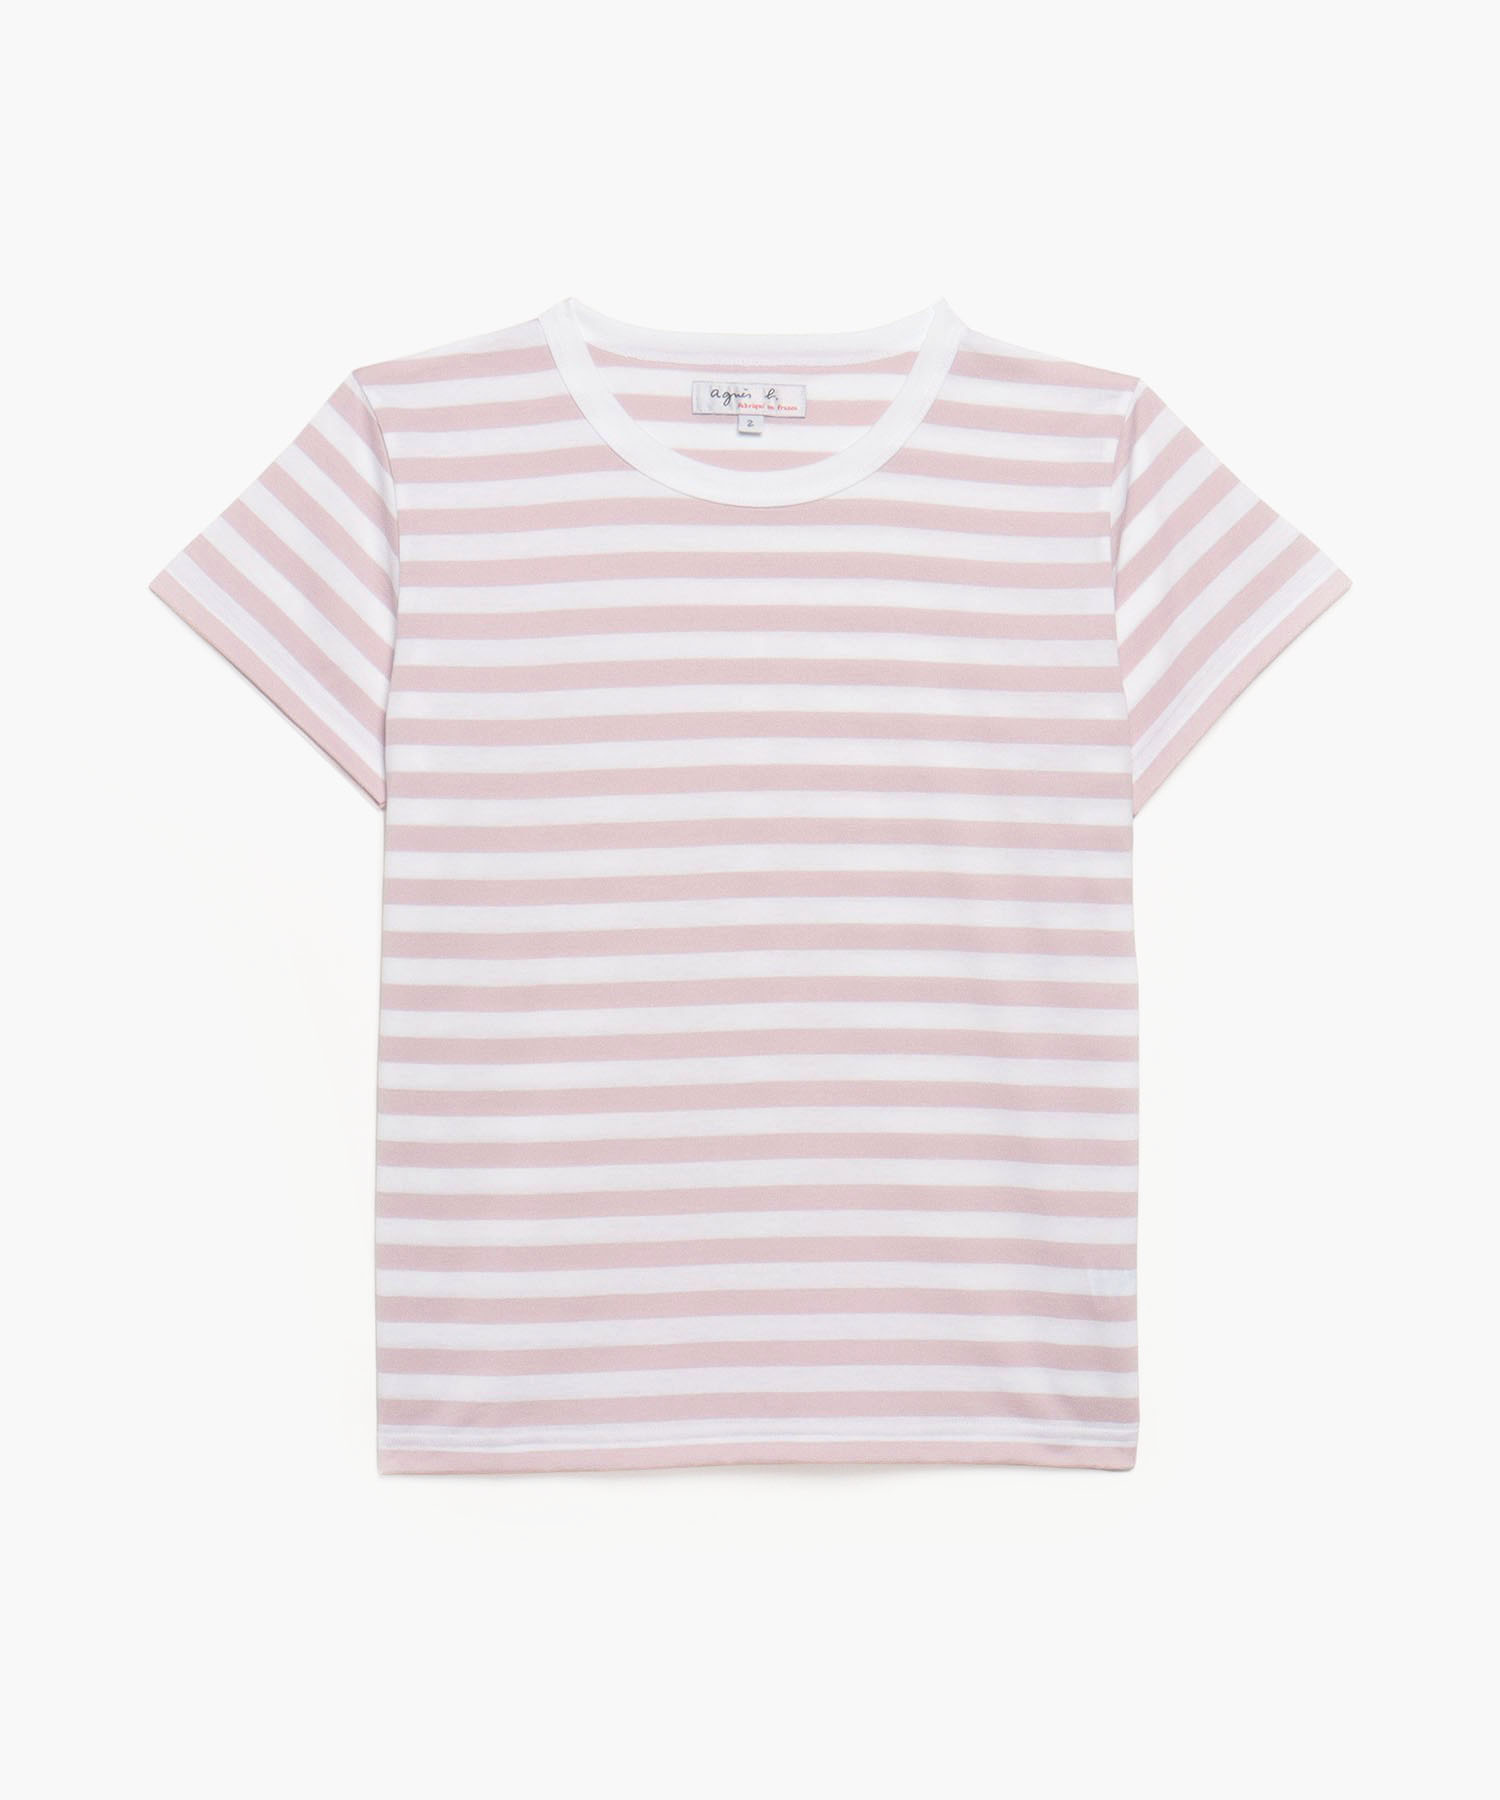 【WEB限定】JS92 TS ボーダーTシャツ